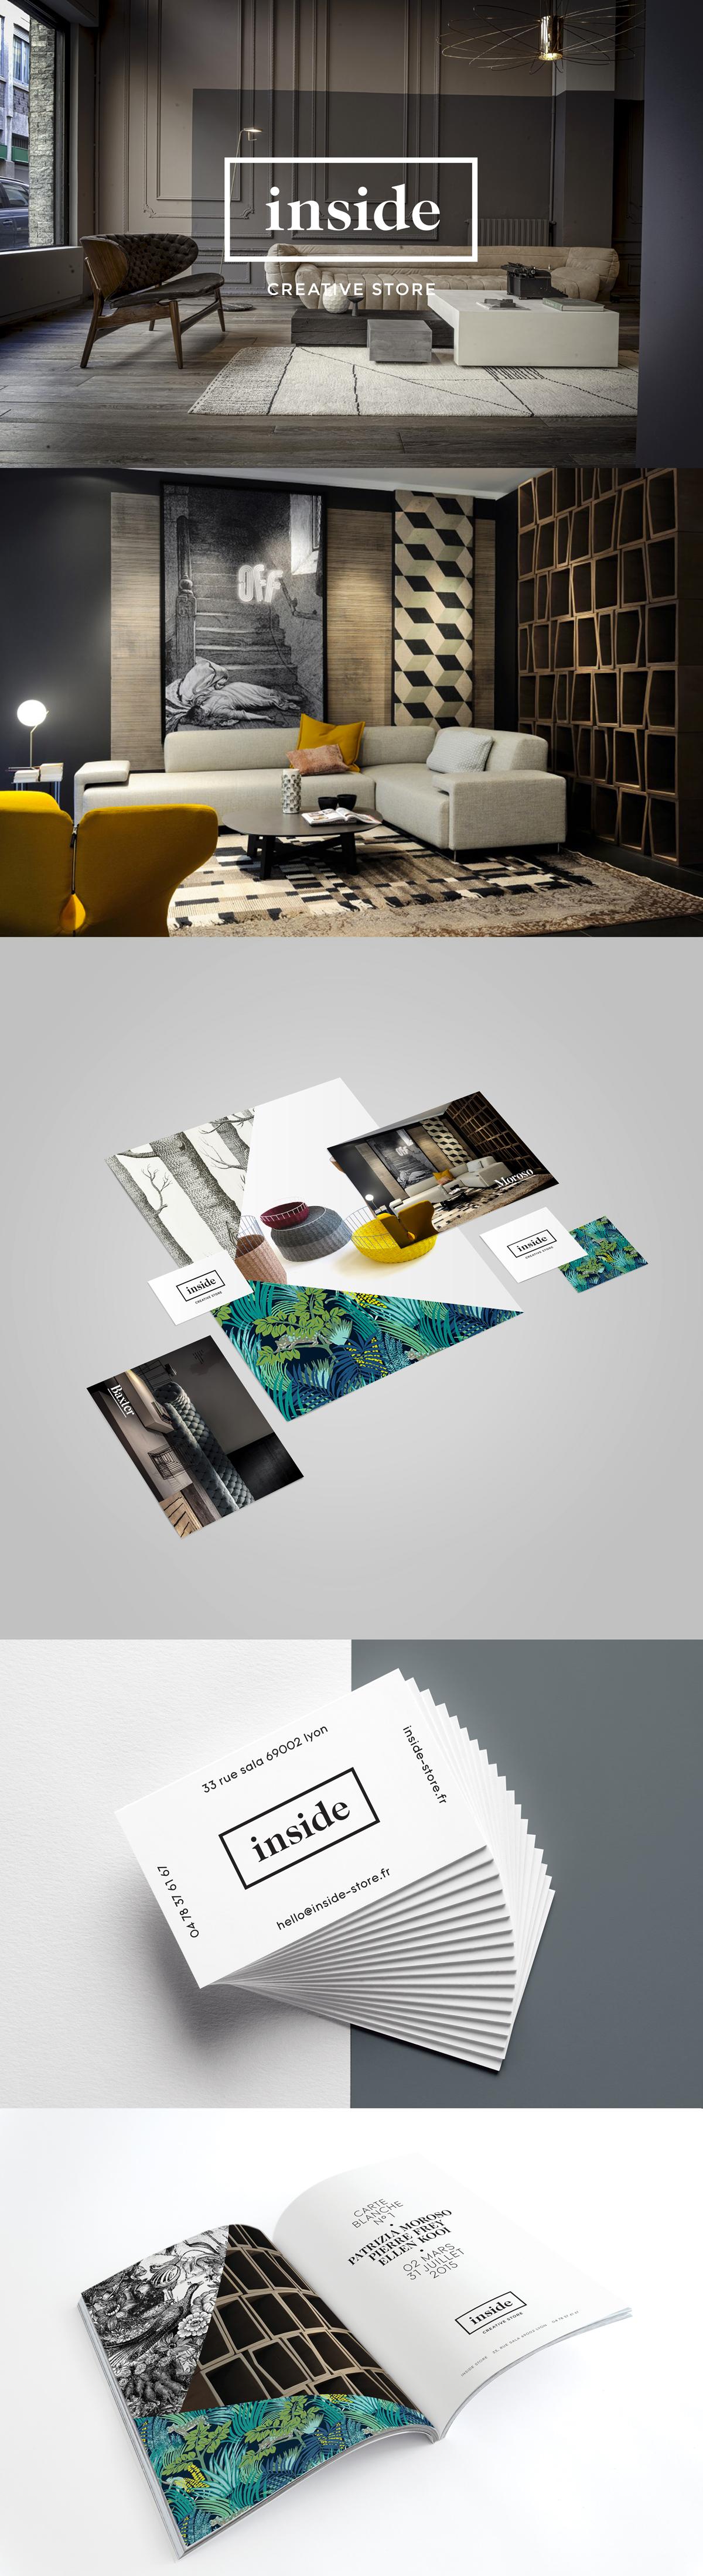 Inside-creative-store-Lyon-Design-©-Studio-Cosmos